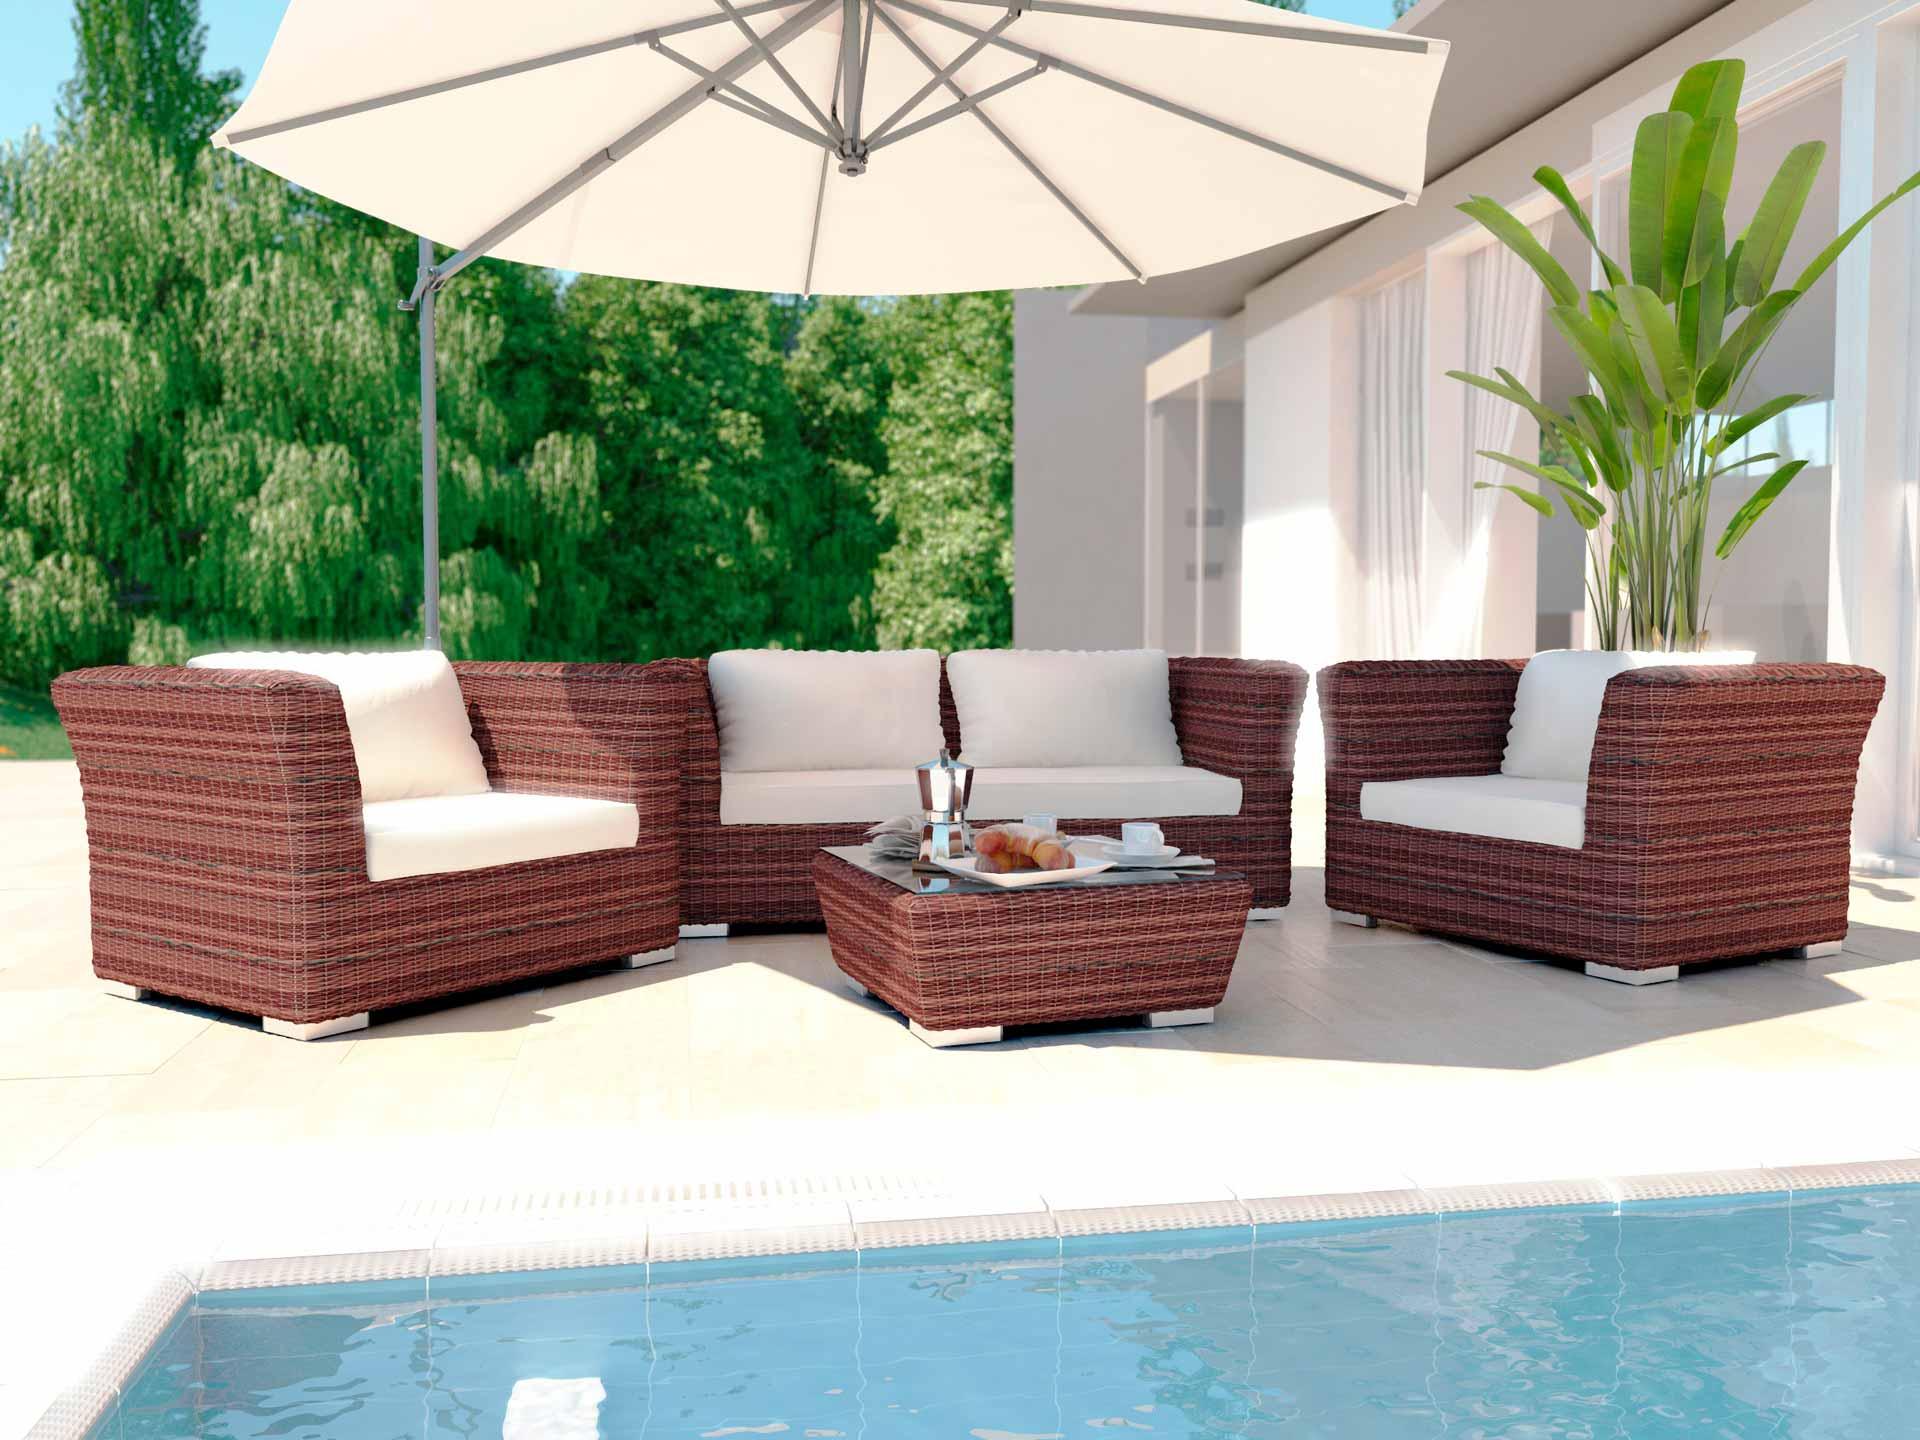 artelia terrassenm bel sitzgruppe rigantona m aus polyrattan. Black Bedroom Furniture Sets. Home Design Ideas